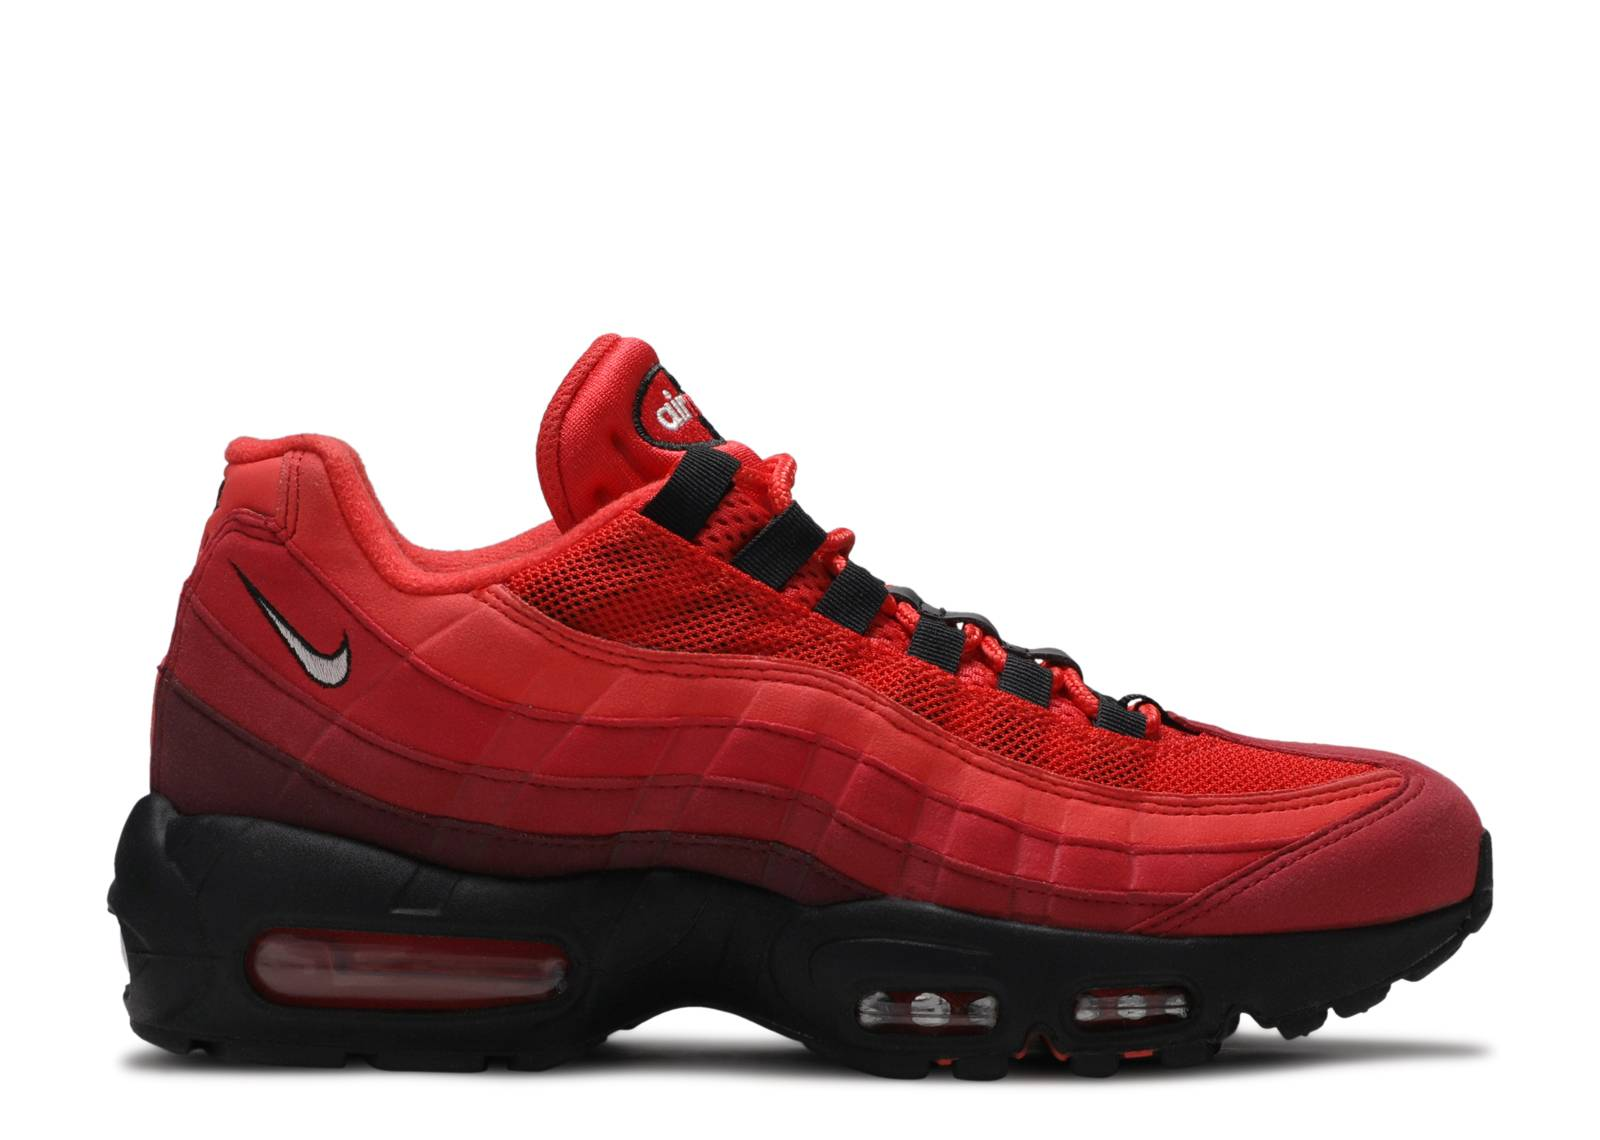 super popular 3ec39 62123 Nike Air Max 95 - Nike - at2865 600 - habanero red white university ...